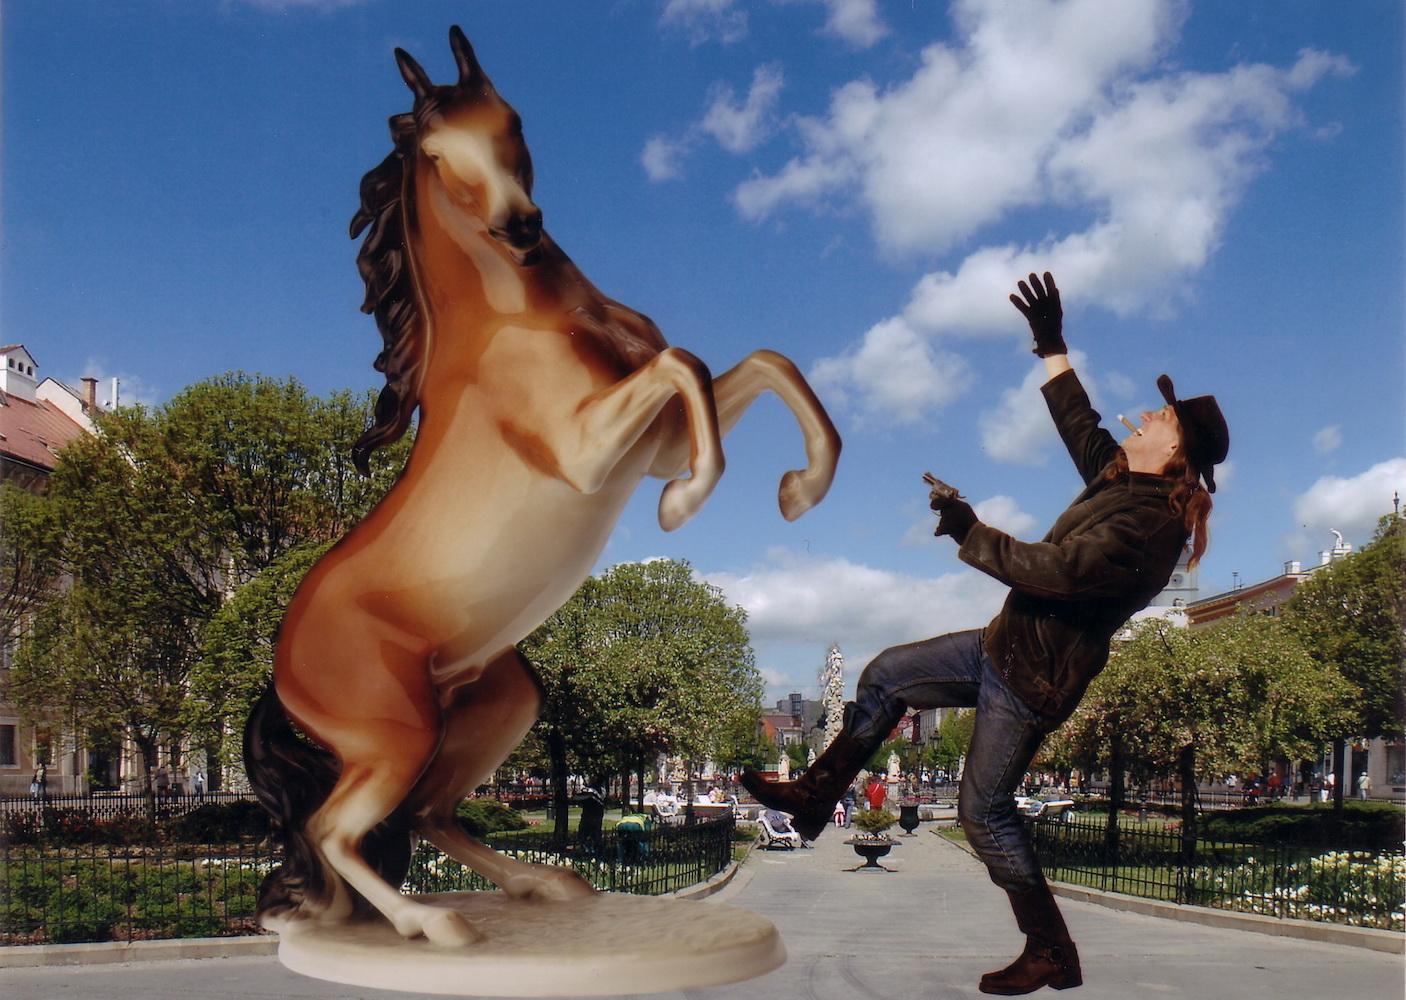 2008, Z tuctového cyklu Bukowski, fotomontáž, 12,5x18 cm